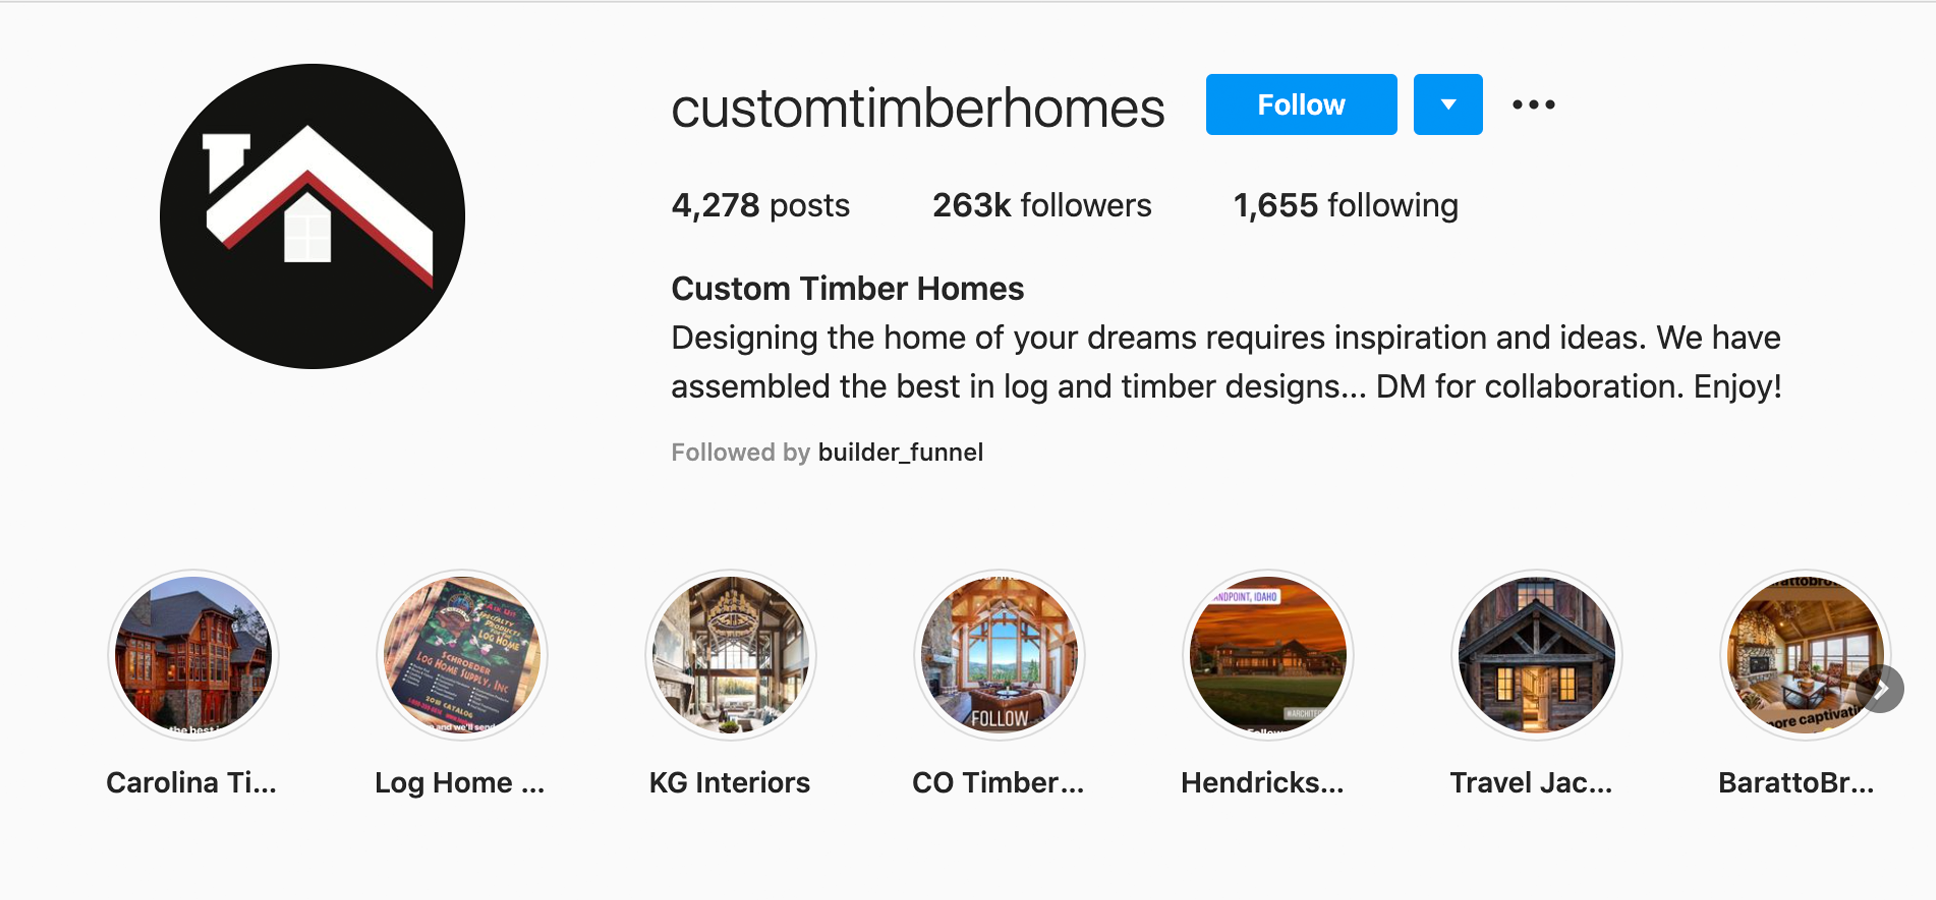 customtimberhomes-instagram-profile